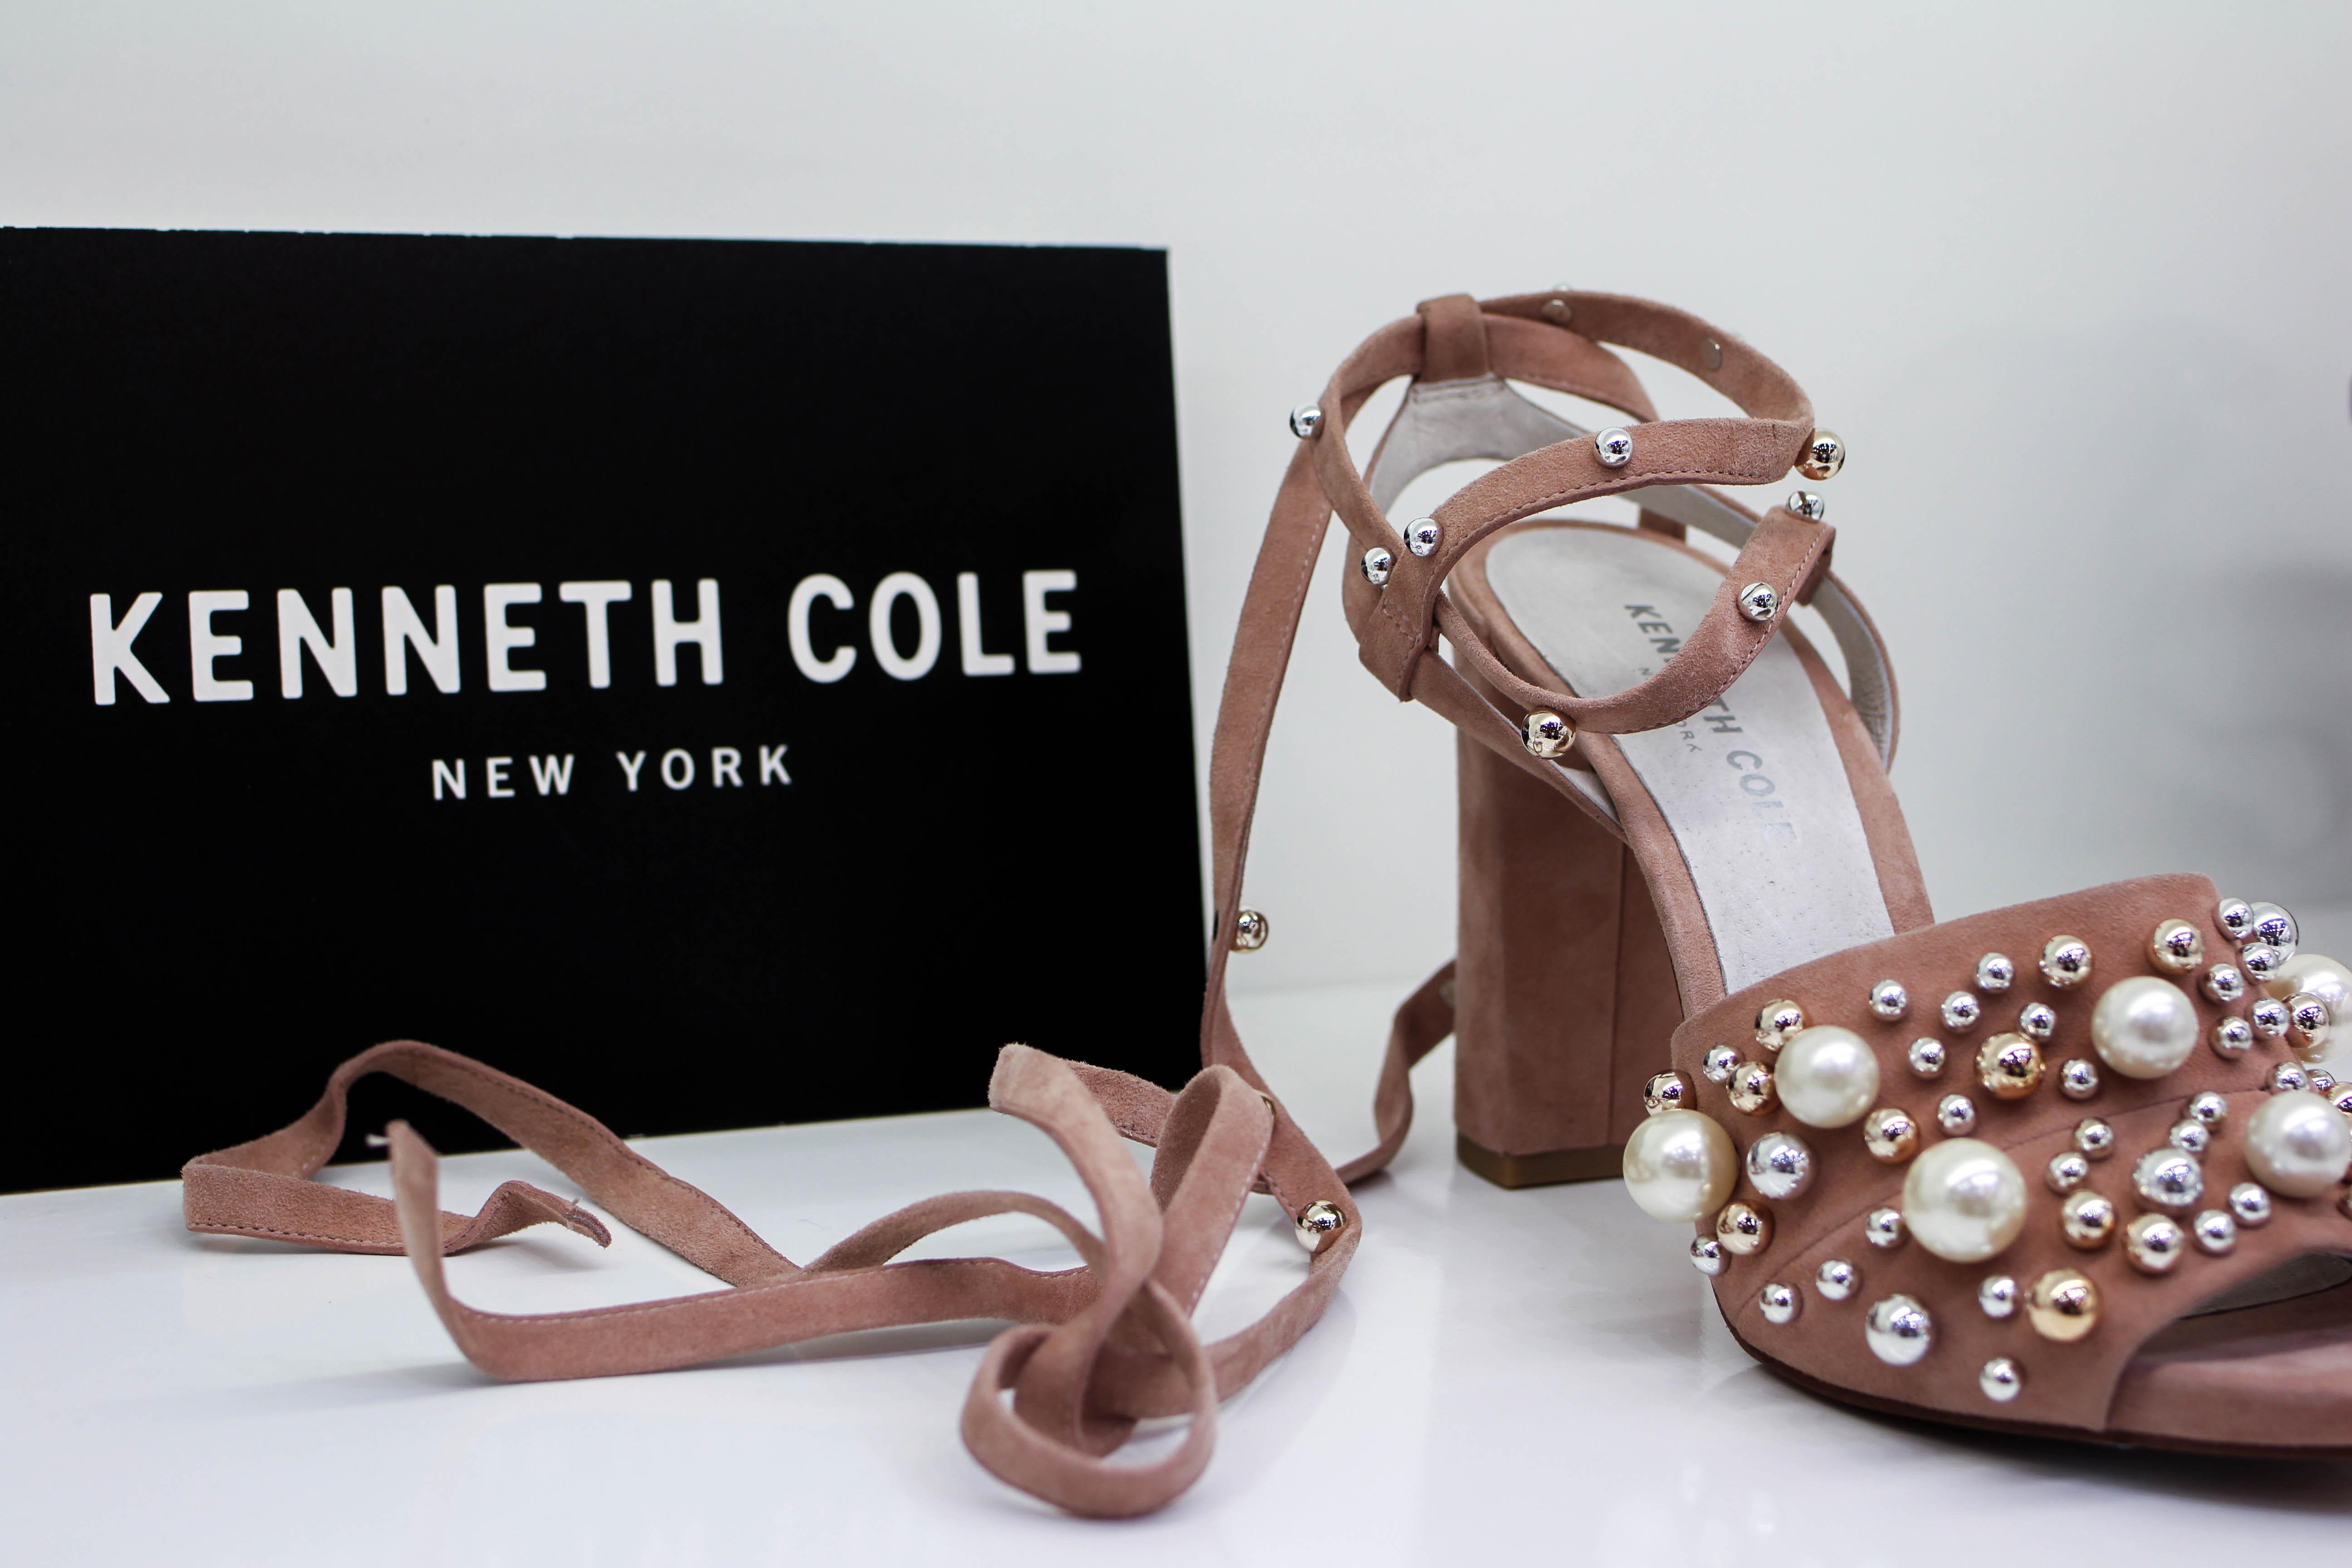 Fashioncircuz by Jenny kenneth-cole 'SHOES' ARE THE GIRLS BEST FRIEND - MEIN TAG AUF DER GDS DÜSSELDORF